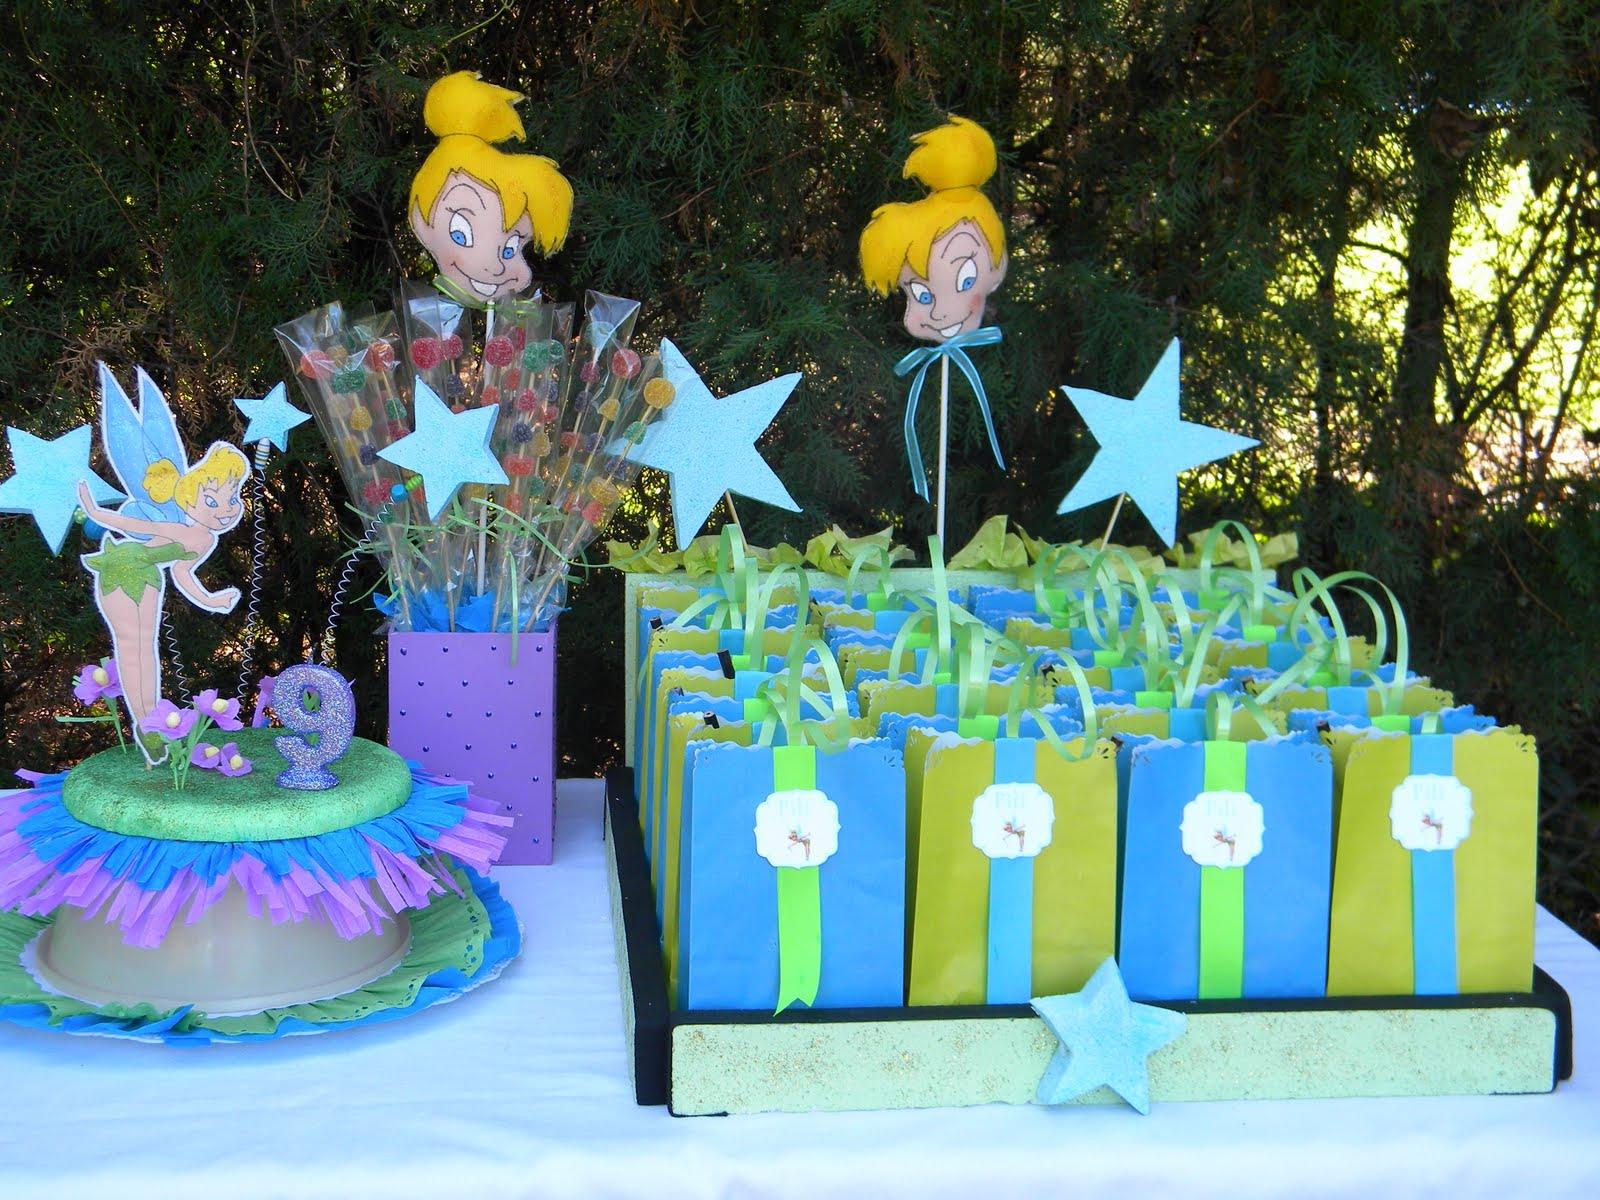 Adornos de tinkerbell para cumpleaños - Imagui